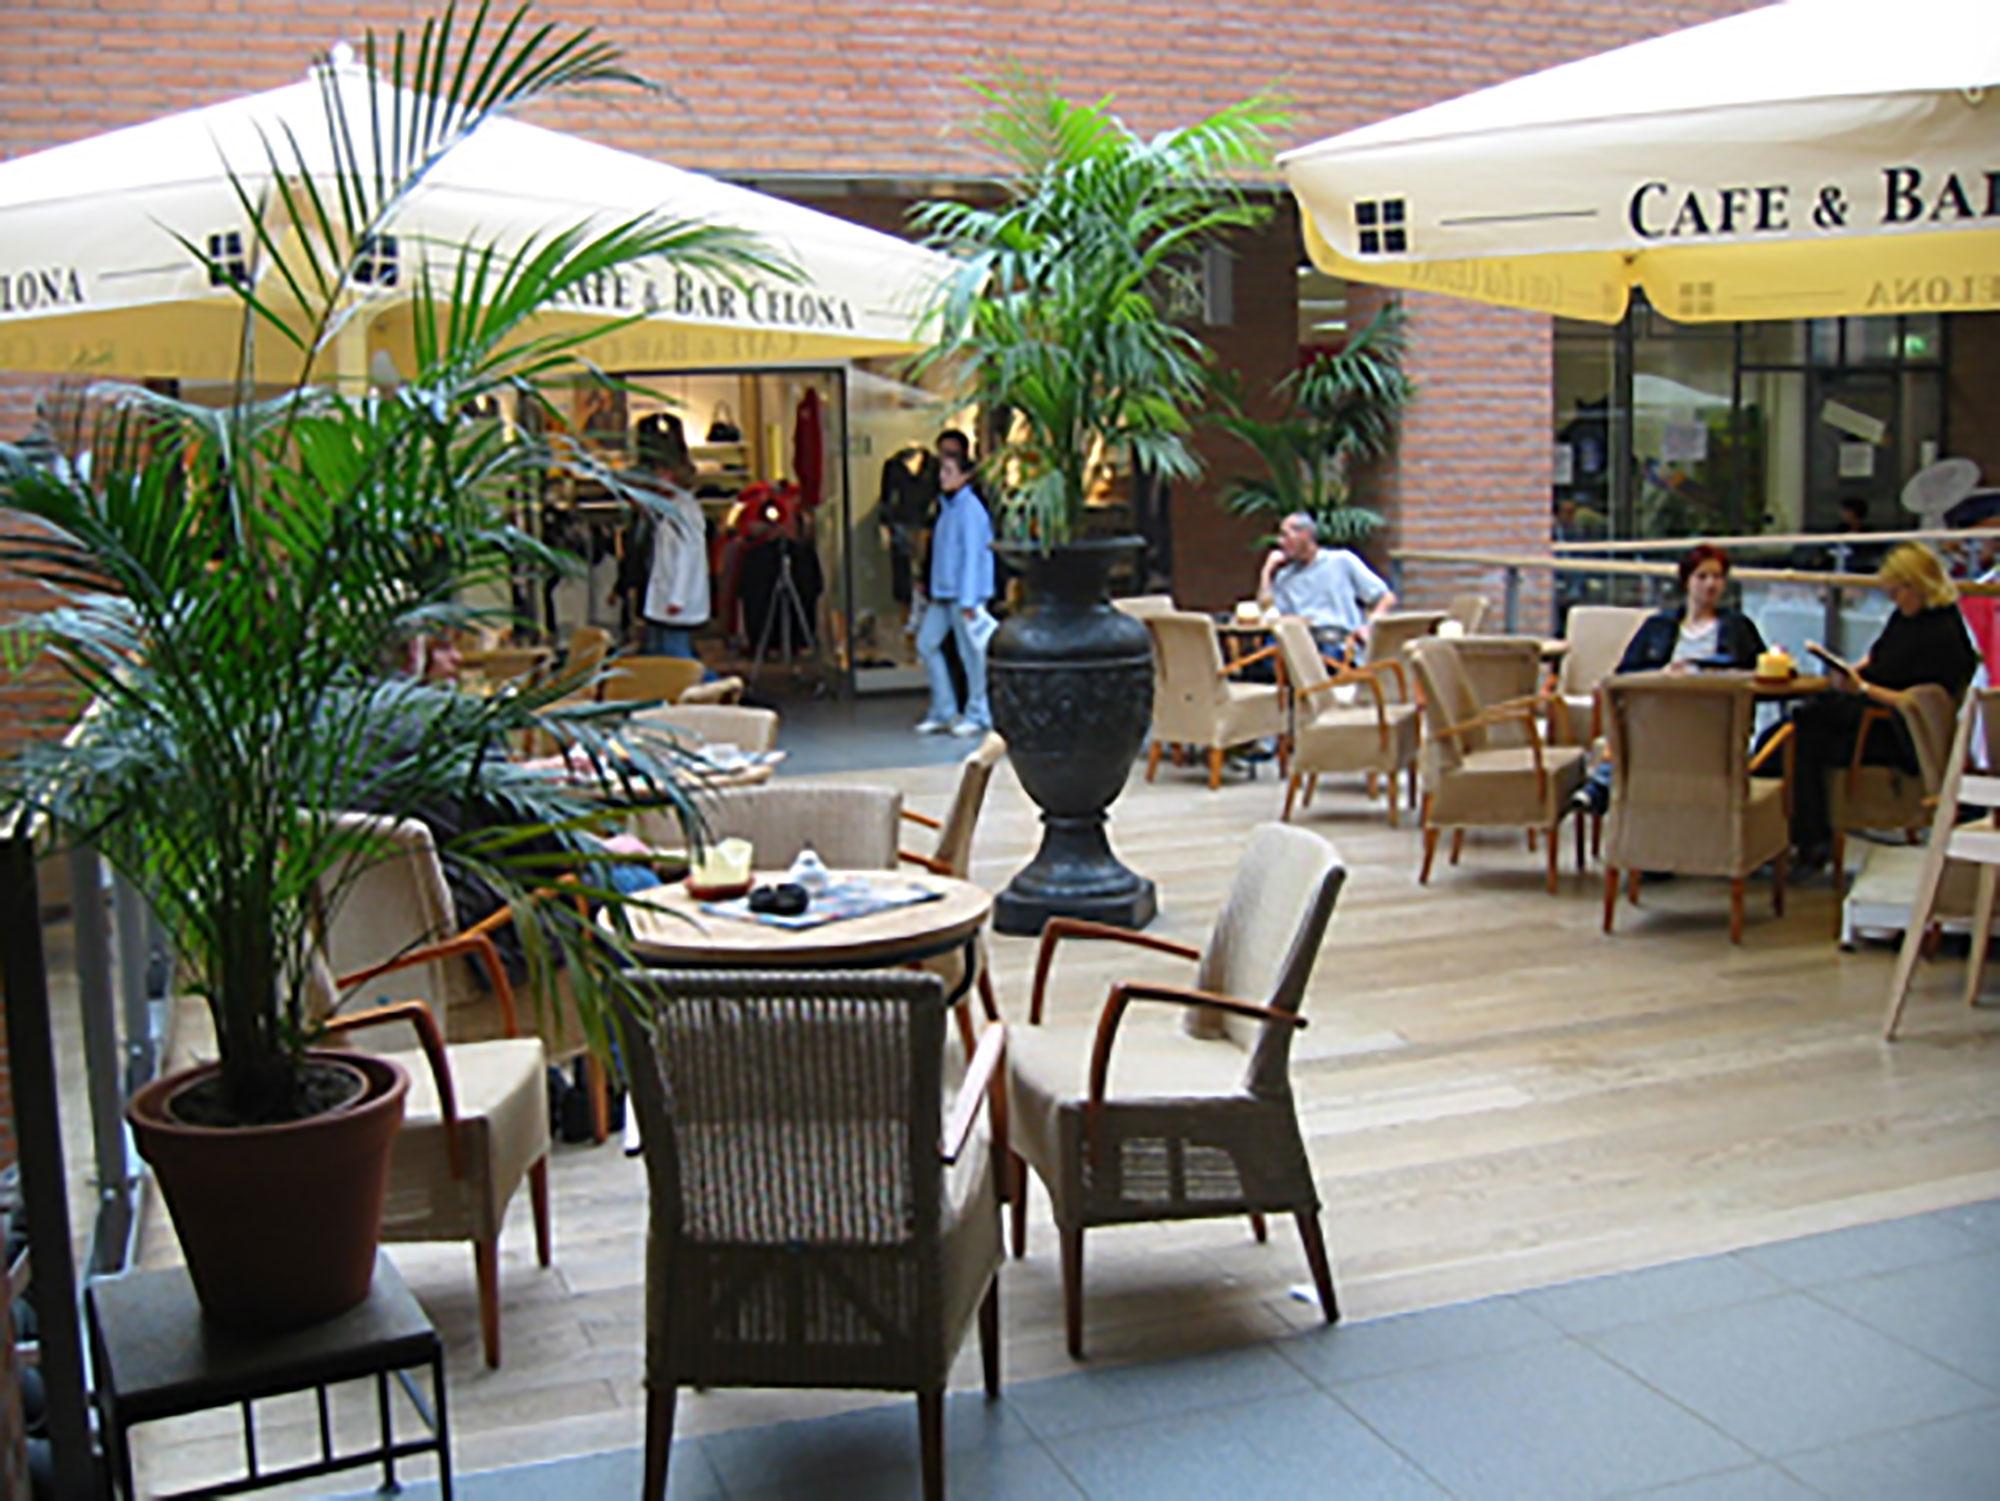 Cafe Bar Celona Wilhelmshaven